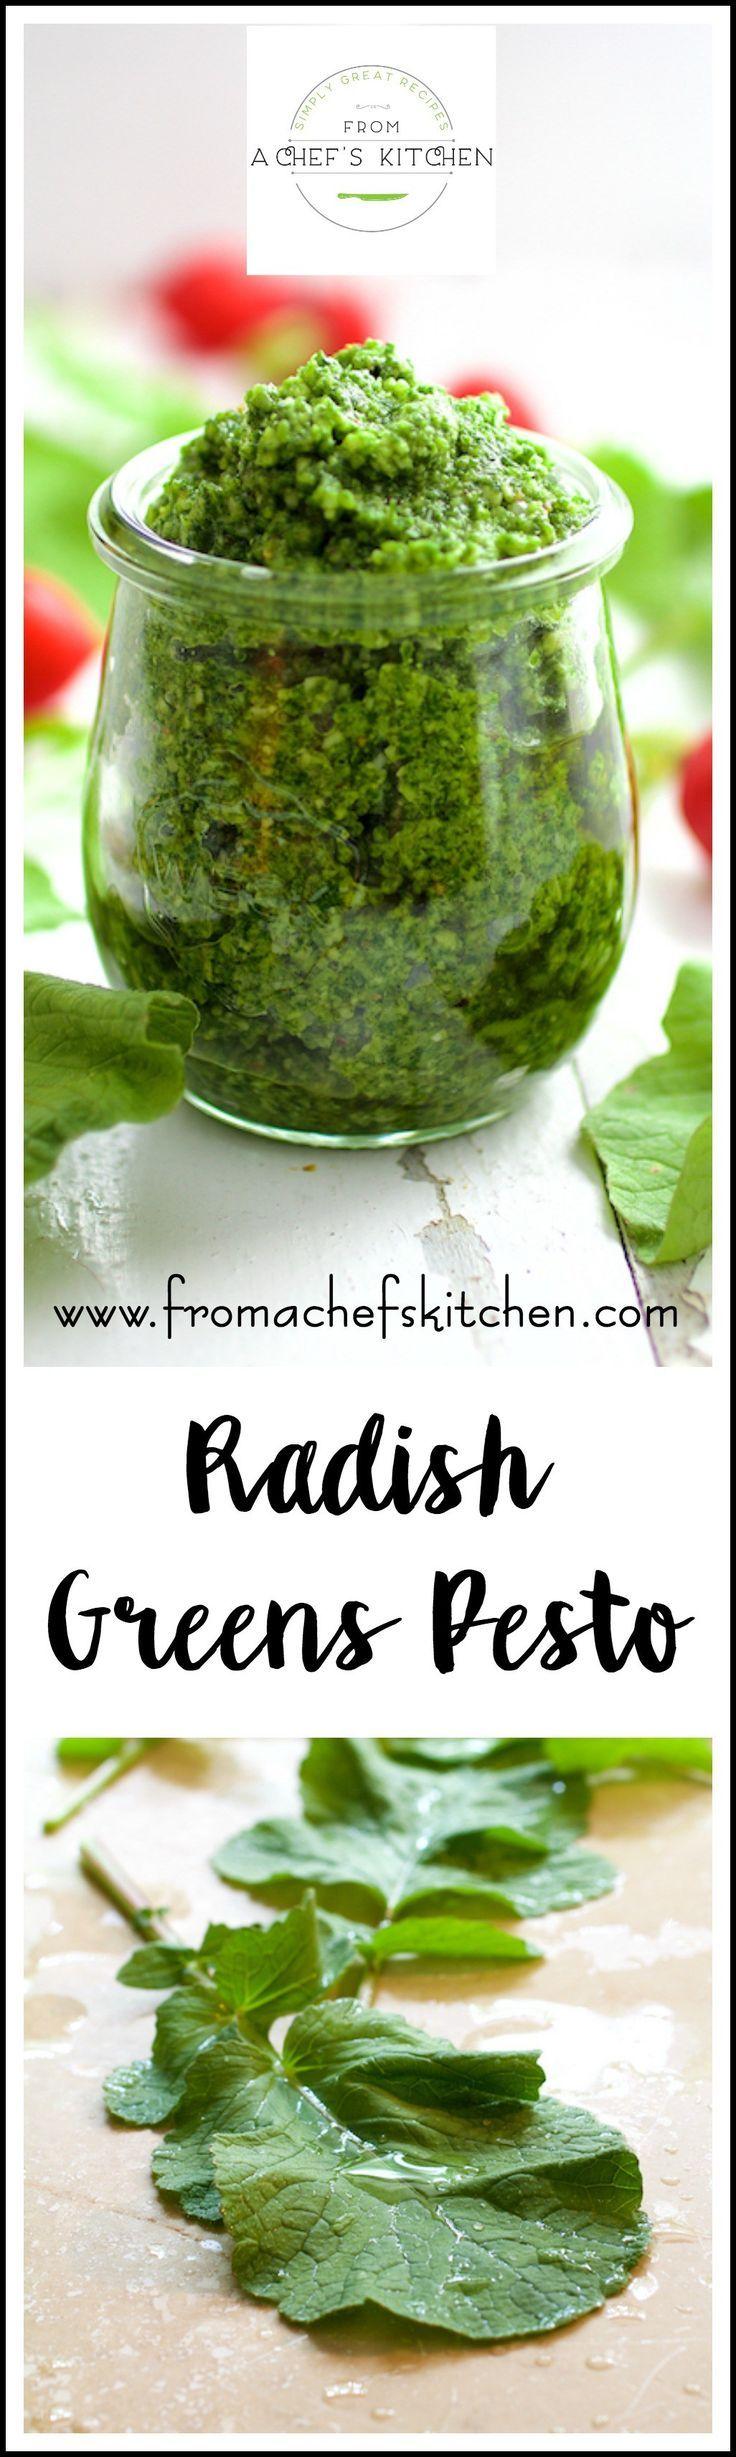 Don't toss those radish greens! Pungent, peppery radish leaves make perfect pesto!